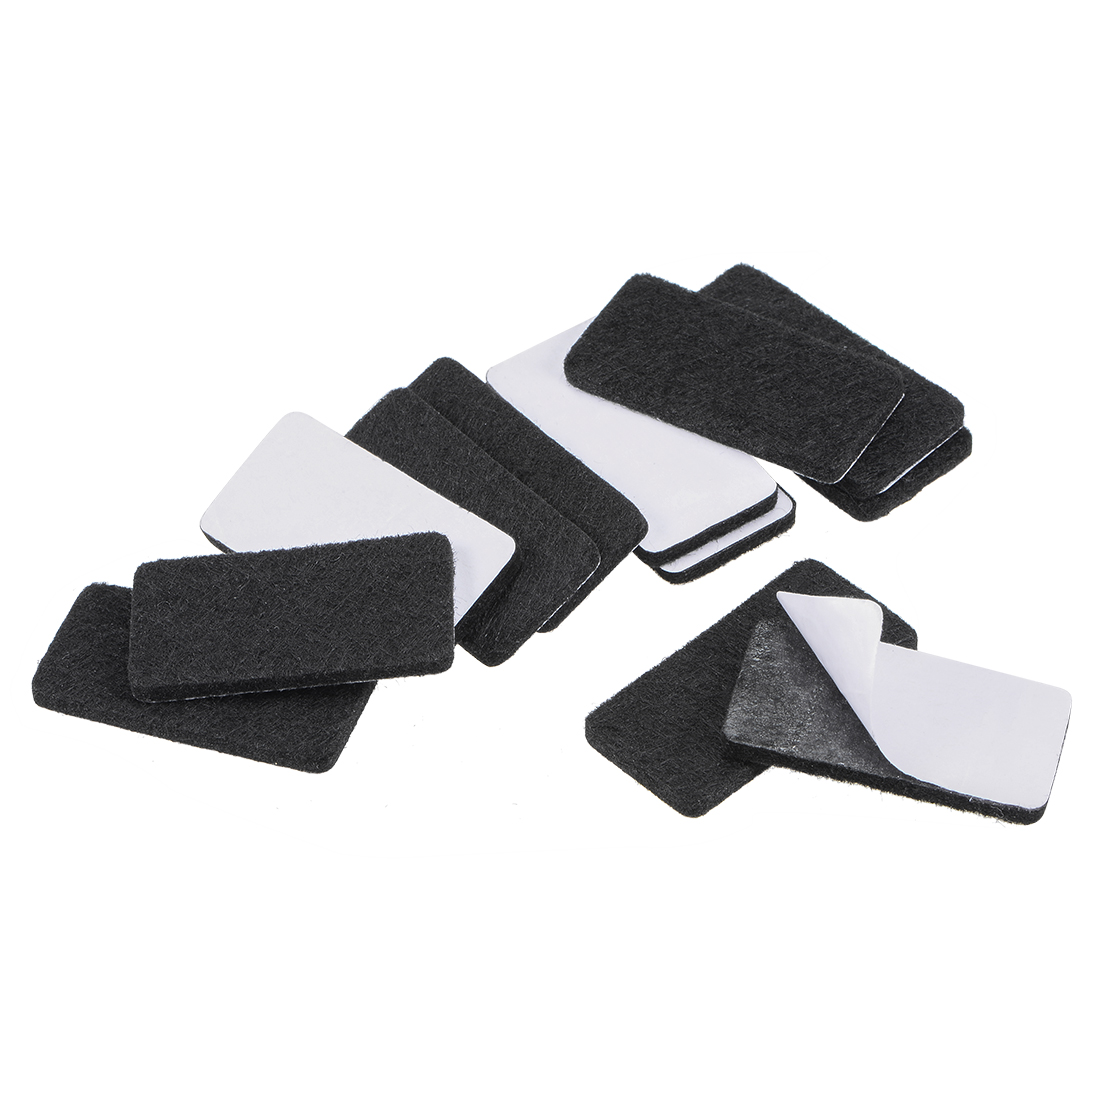 Furniture Pads 40mm x 20mm Adhesive Felt Pads 3mm Thick Black 12Pcs